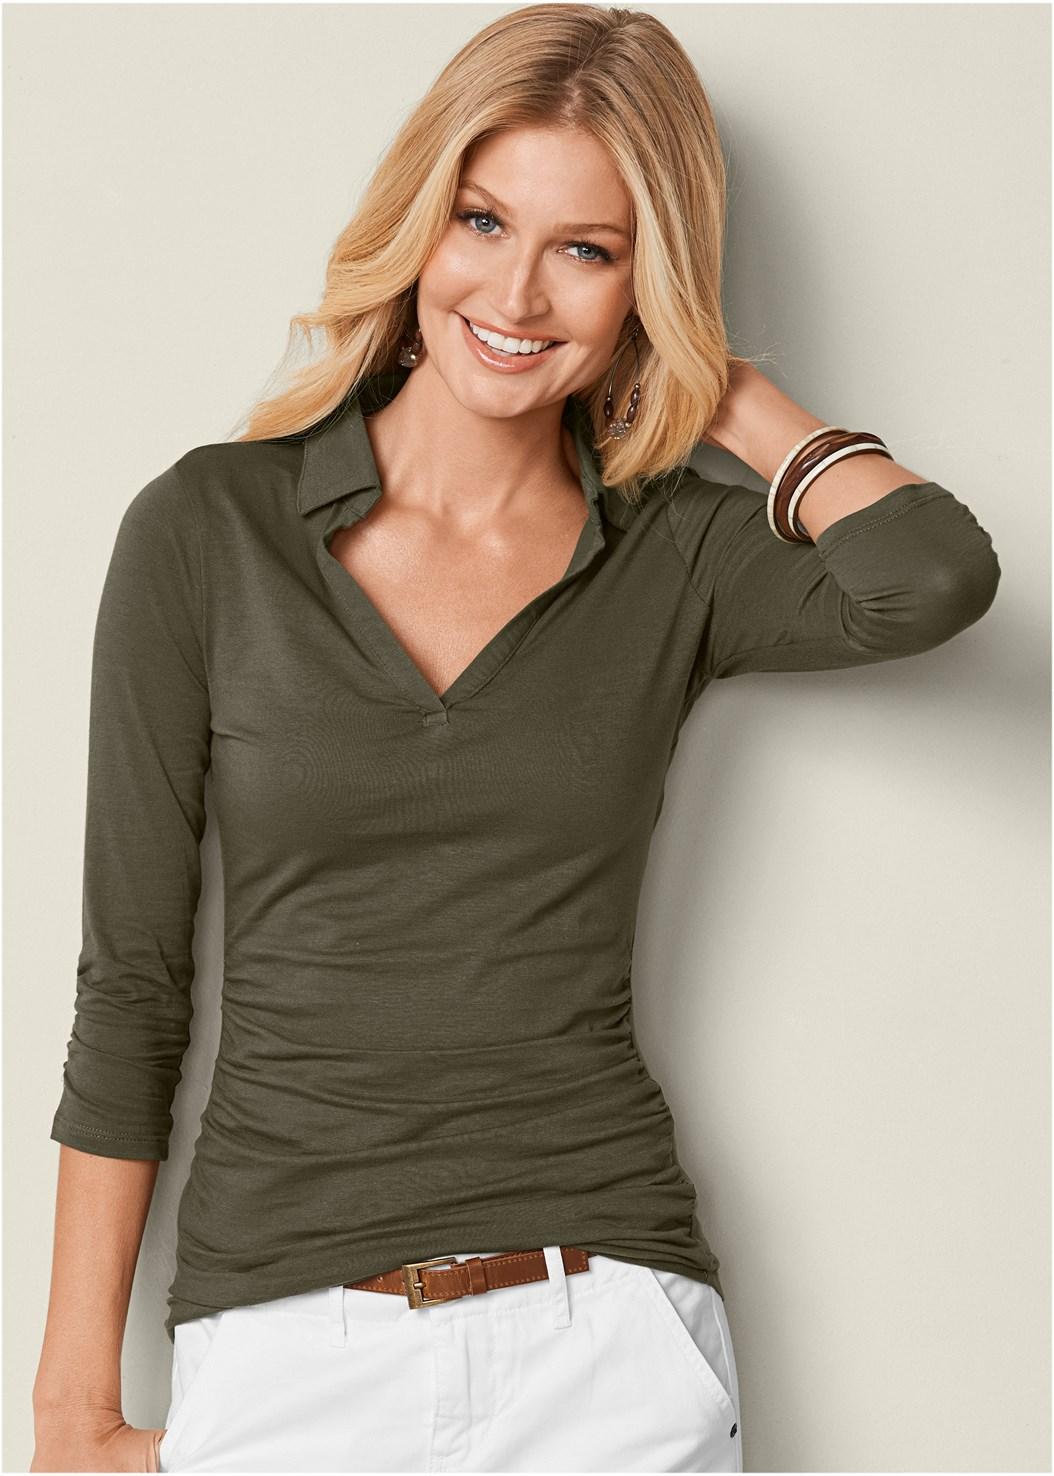 Knit Shirt,Belted Cuffed Shorts